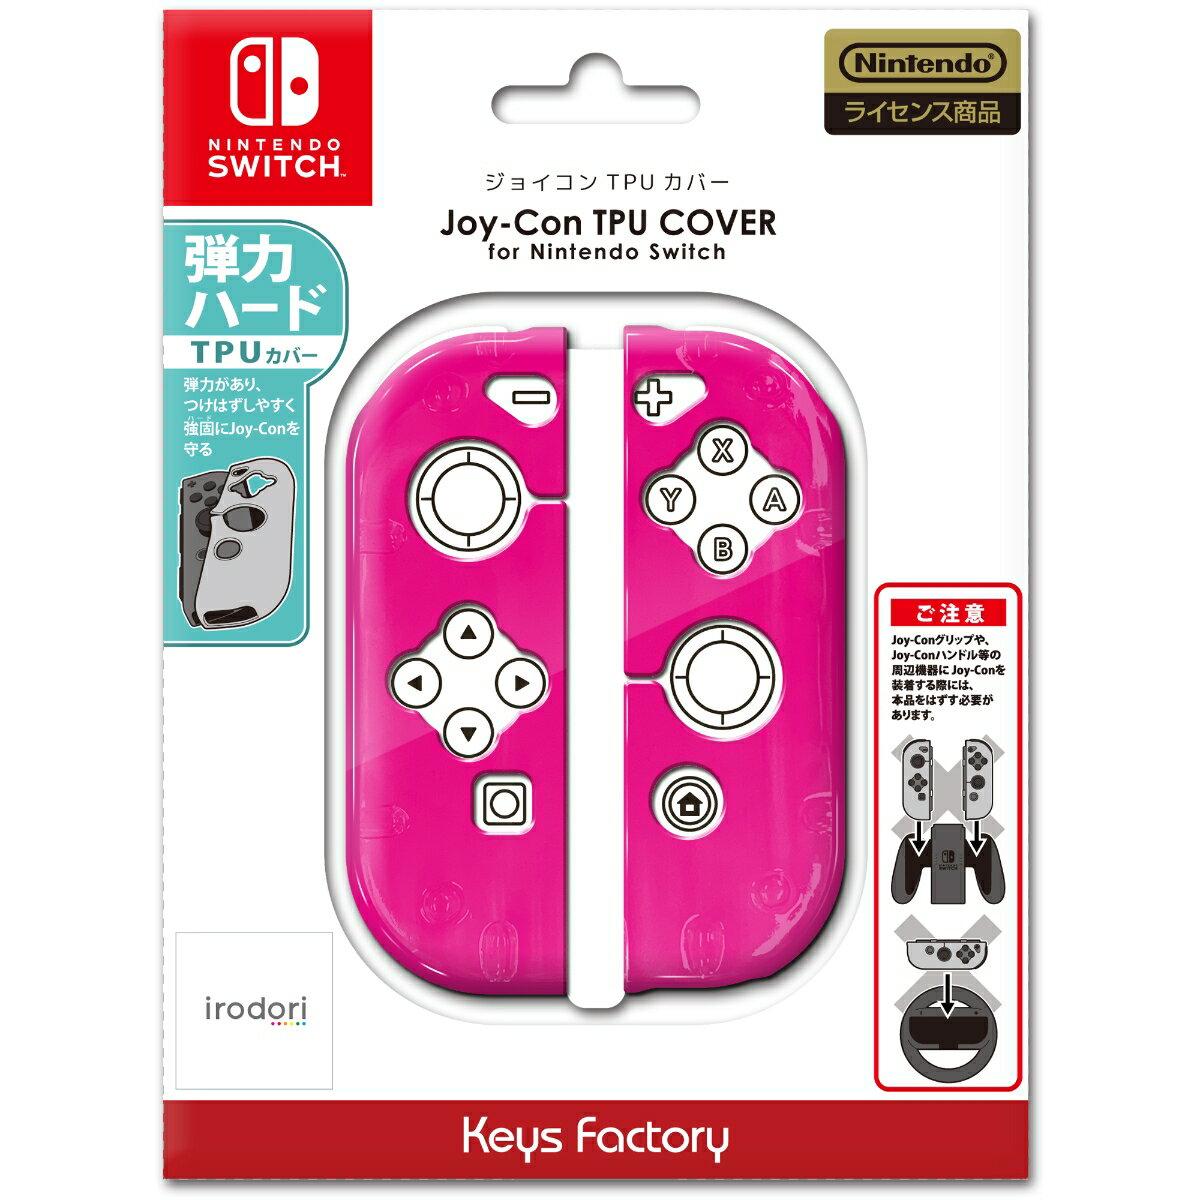 Nintendo Switch, 周辺機器 Joy-Con TPU COVER for Nintendo Switch